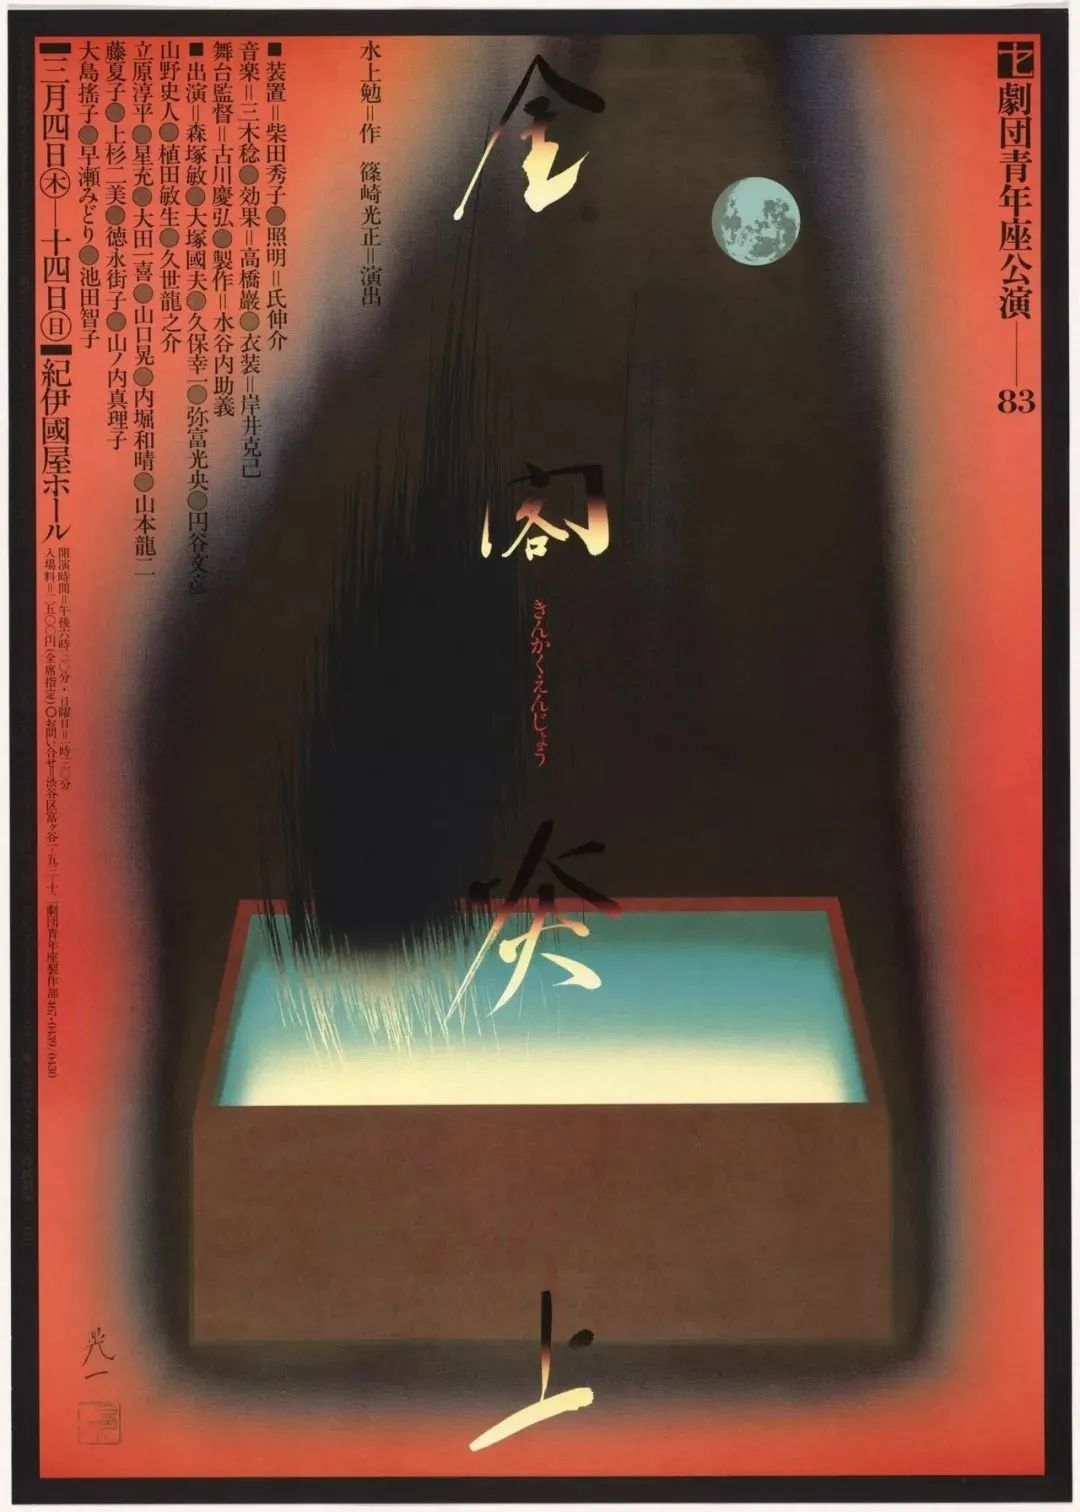 佐藤晃一Koichi Sato. Kinkaku Enjo. 1983